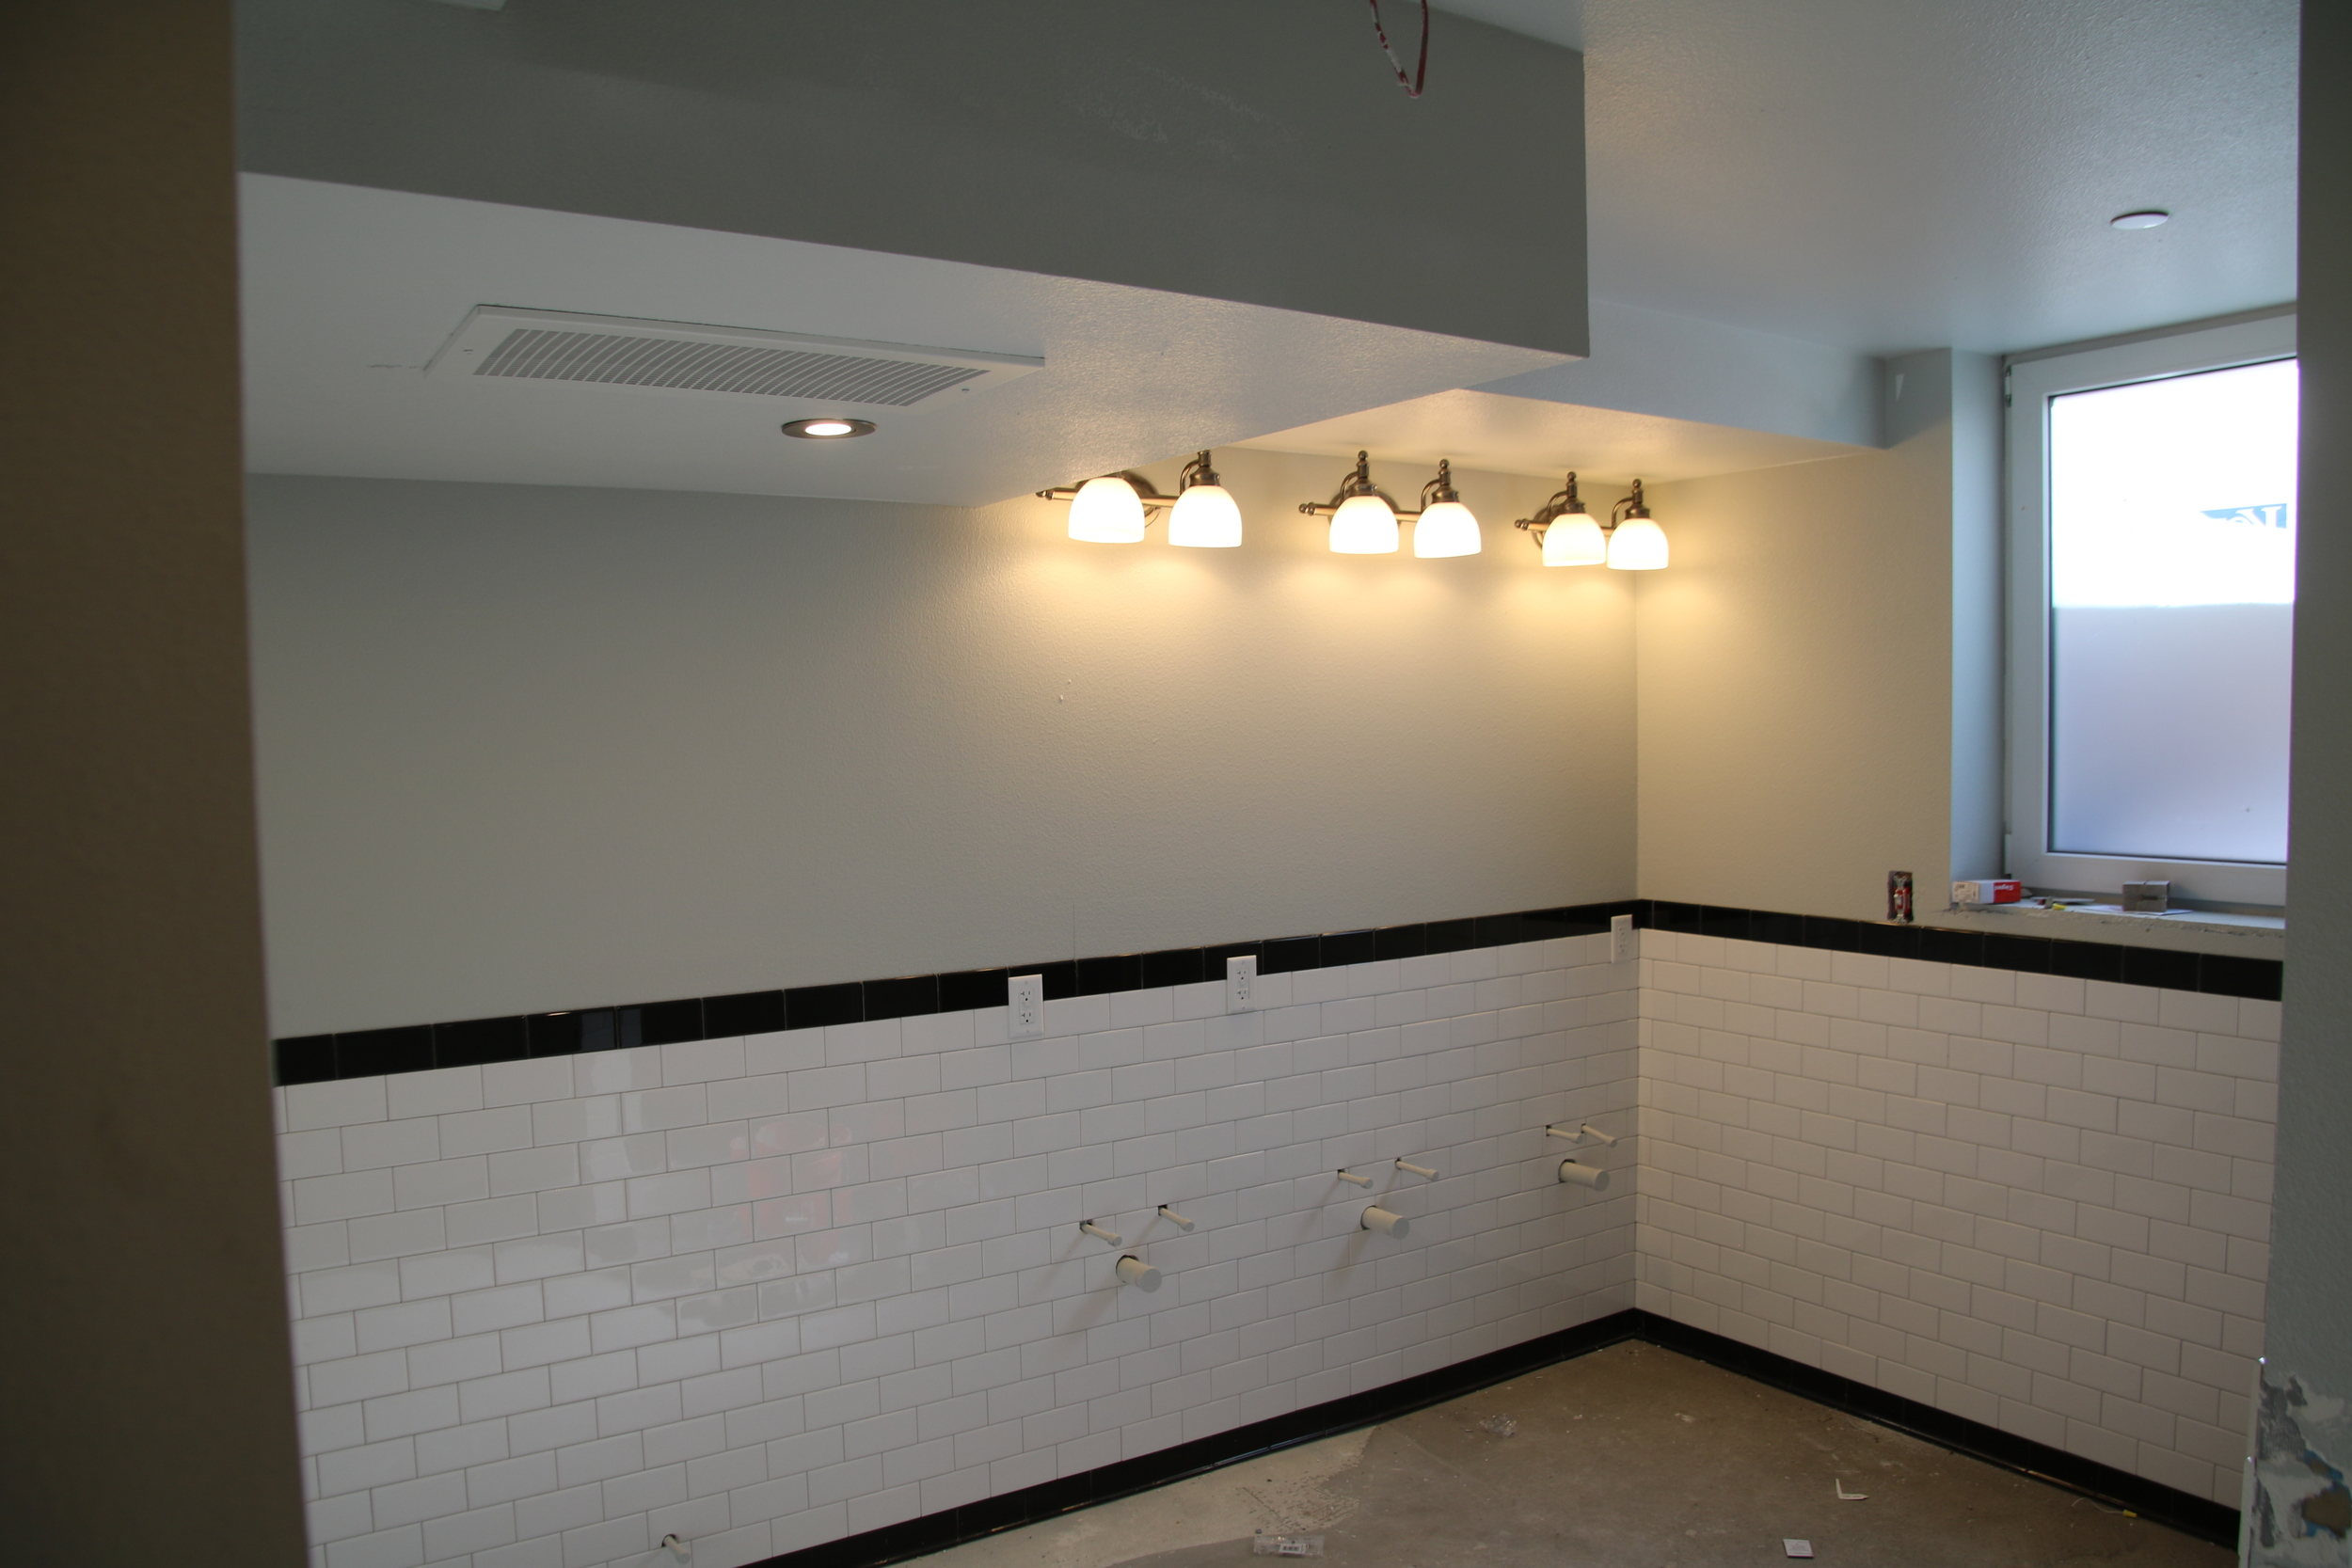 2016-02-03 Basement Bathroom vanity area.JPG